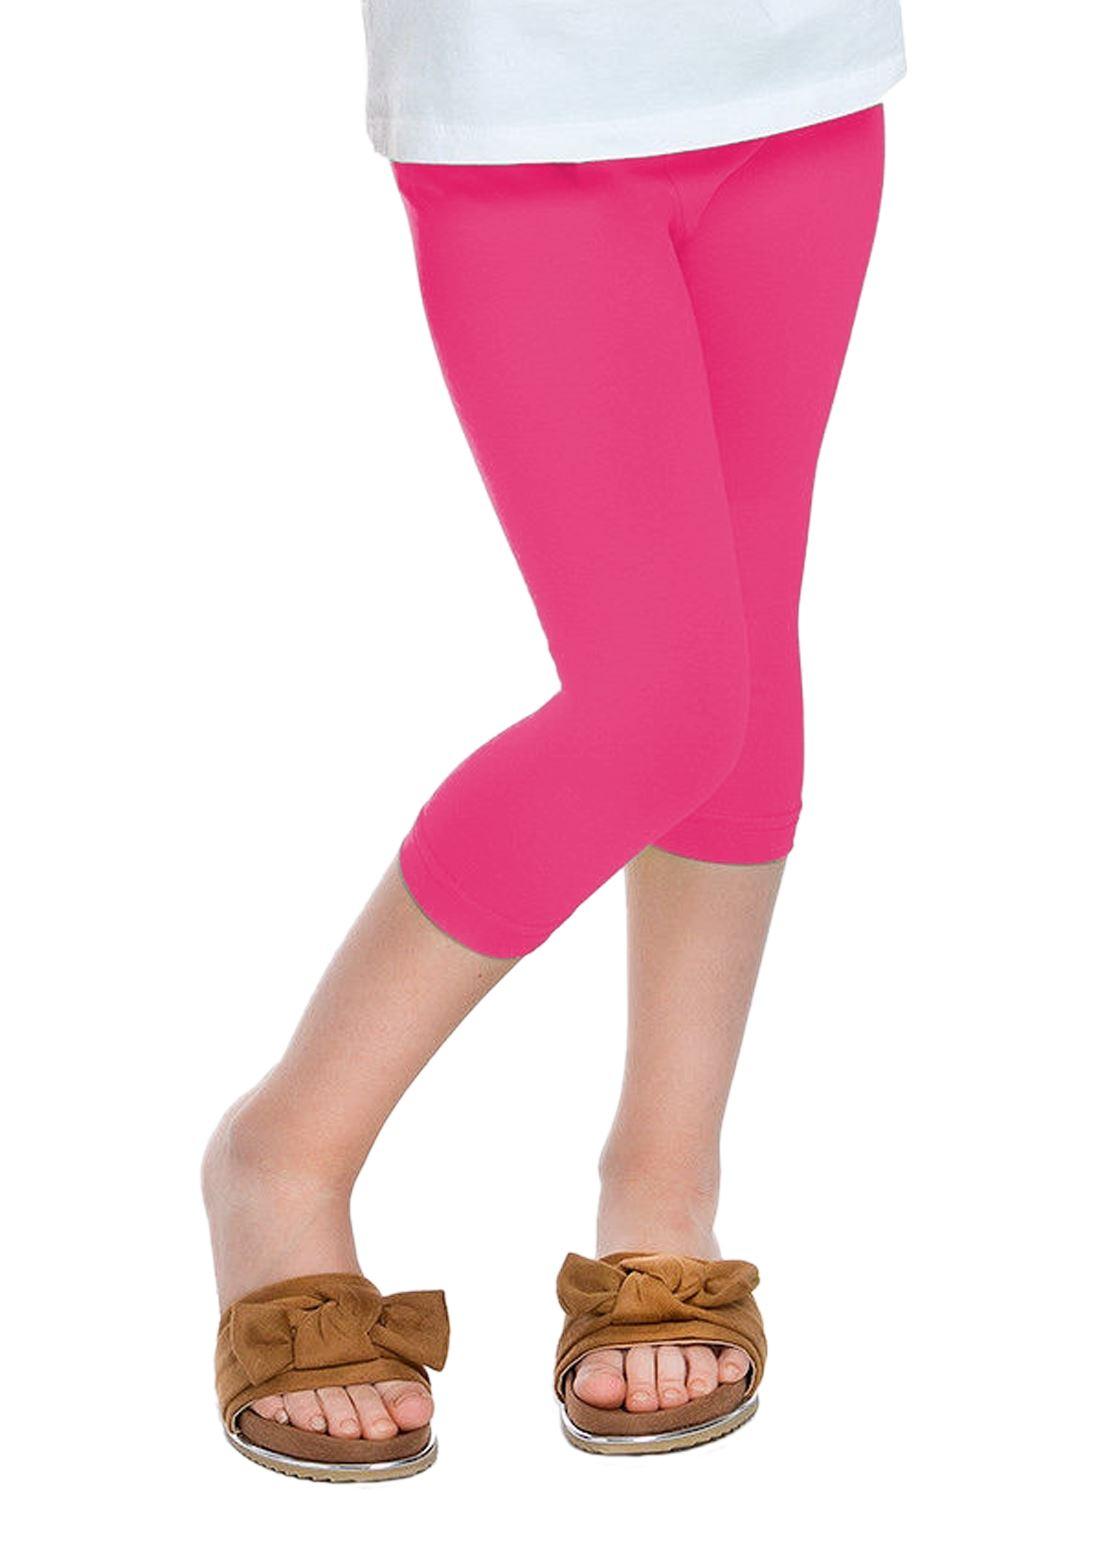 Janisramone Children Girls New Plain Basic Cotton Thick Full Length Leggings Stretch Party Pants All Ages